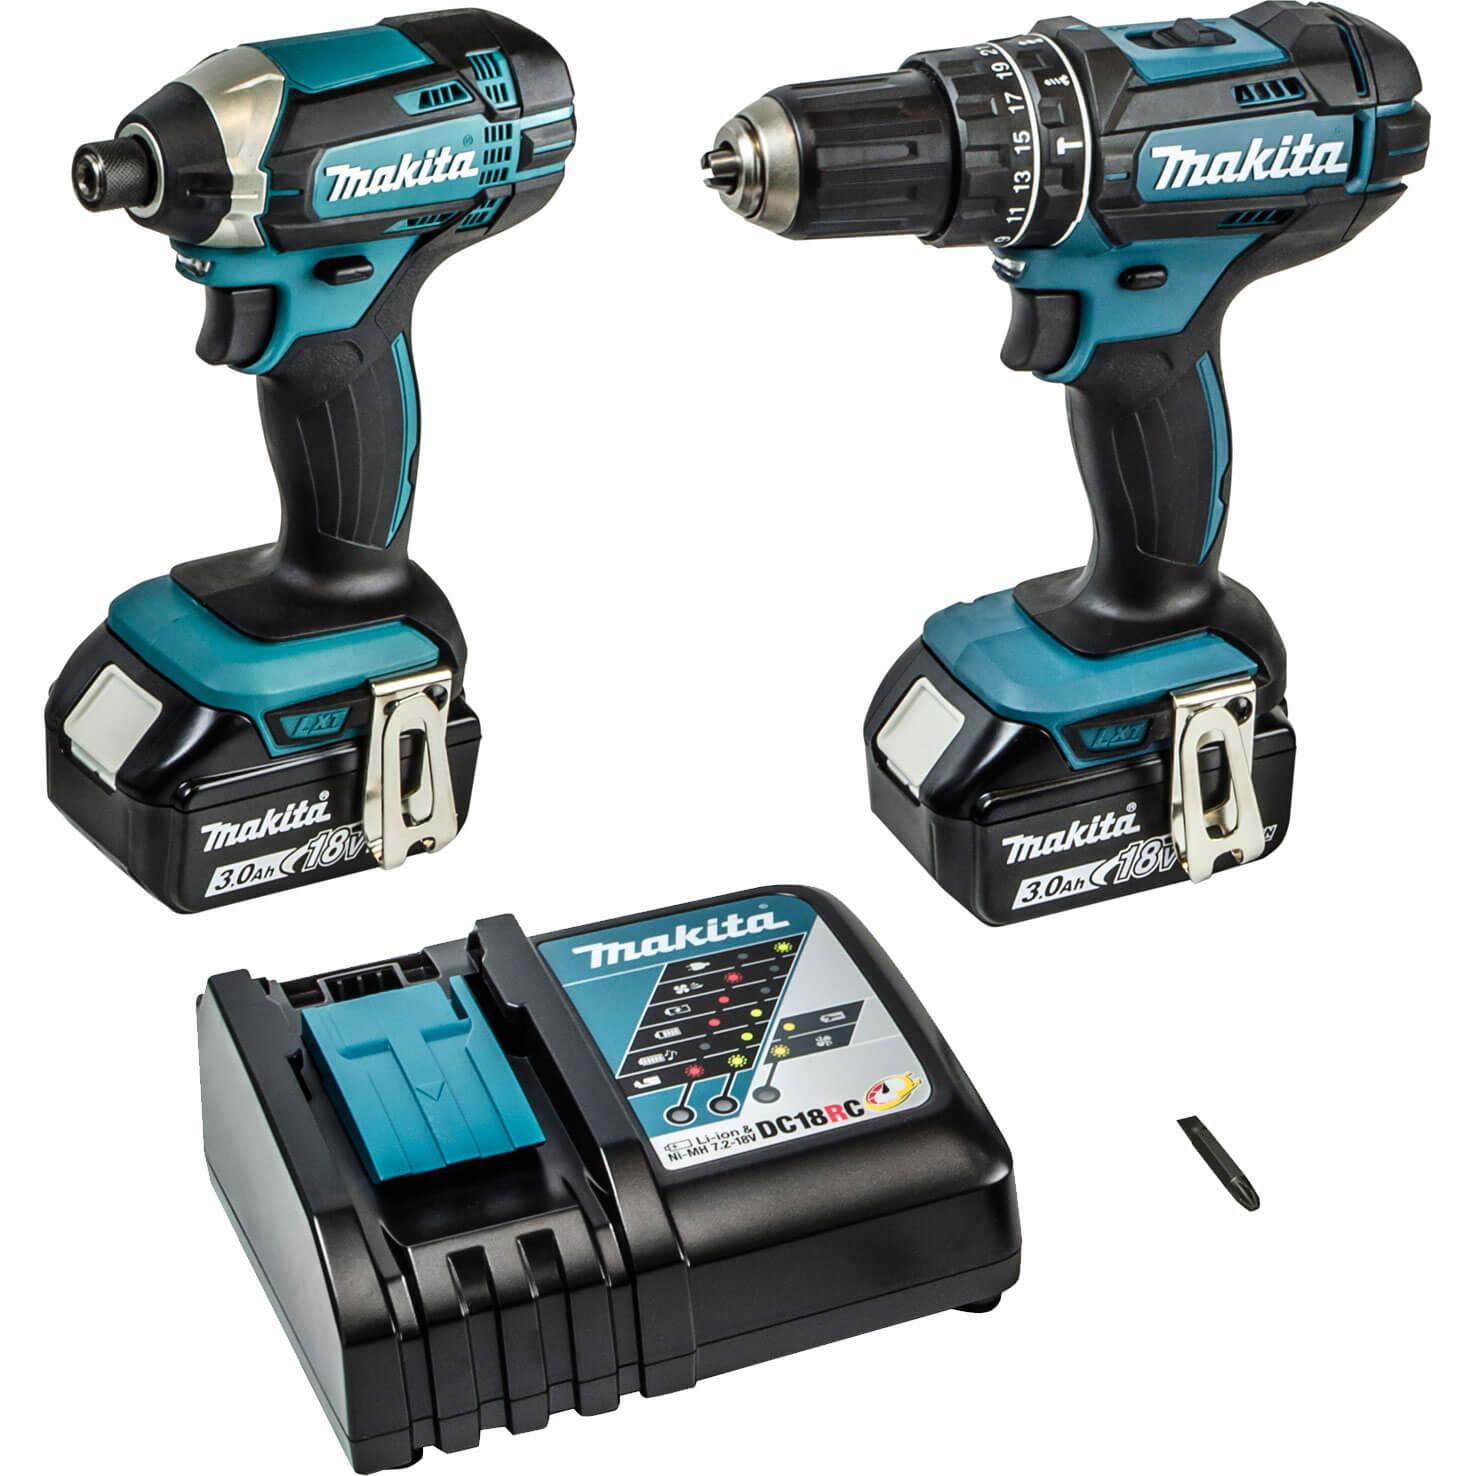 Makita DLX2131 18v Cordless LXT Combi Drill & Impact Driver with 2 Liion Batteries 3ah